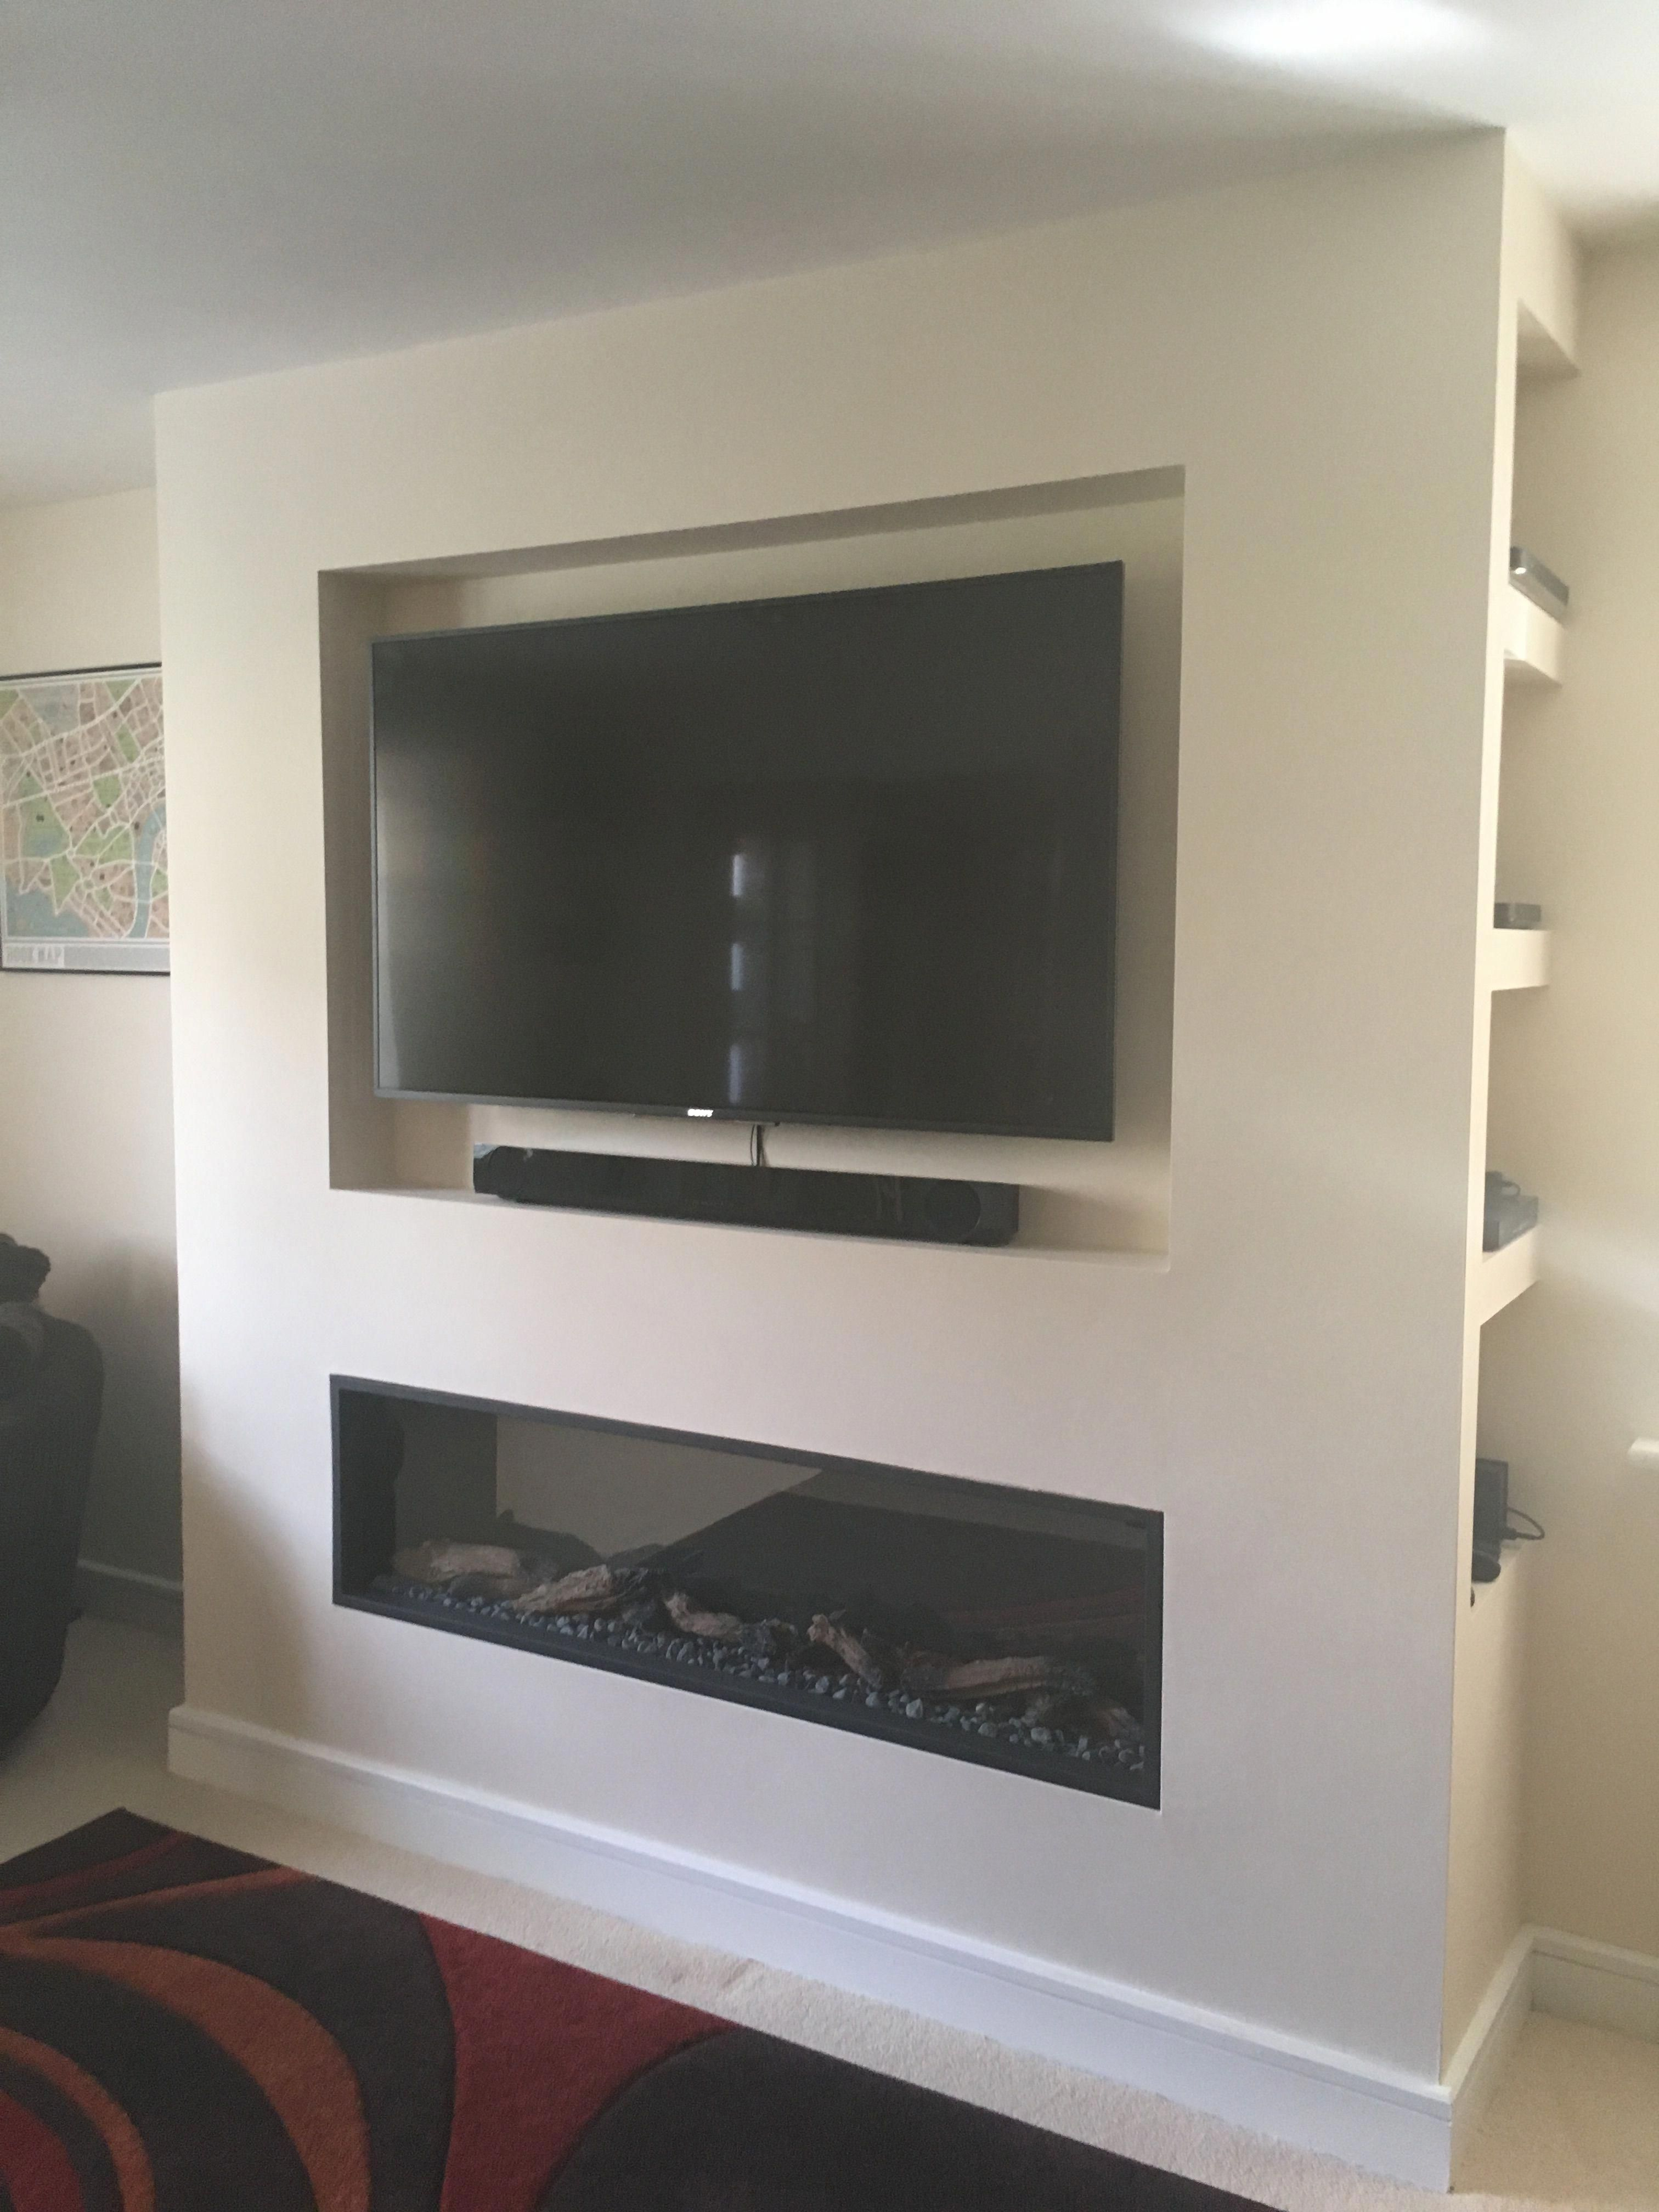 Wall Mounted, Recessed Tv, Sound Bar, Inset Fireplace, Modern, Hidden Shelves, Electrical